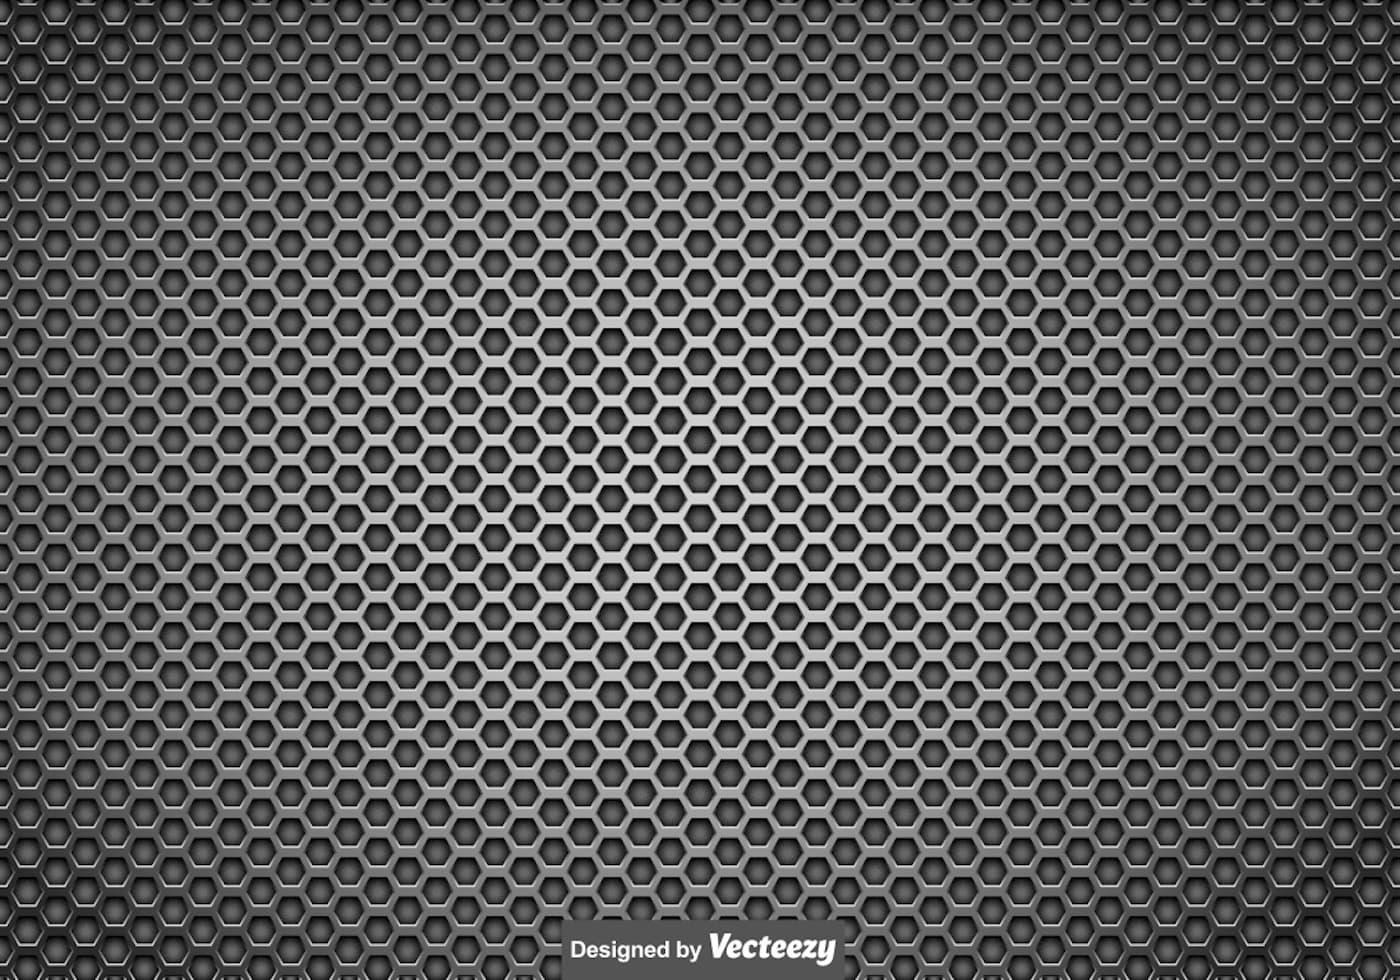 Black Diamond Plate Wallpaper Metal Grill Free Vector Art 4216 Free Downloads